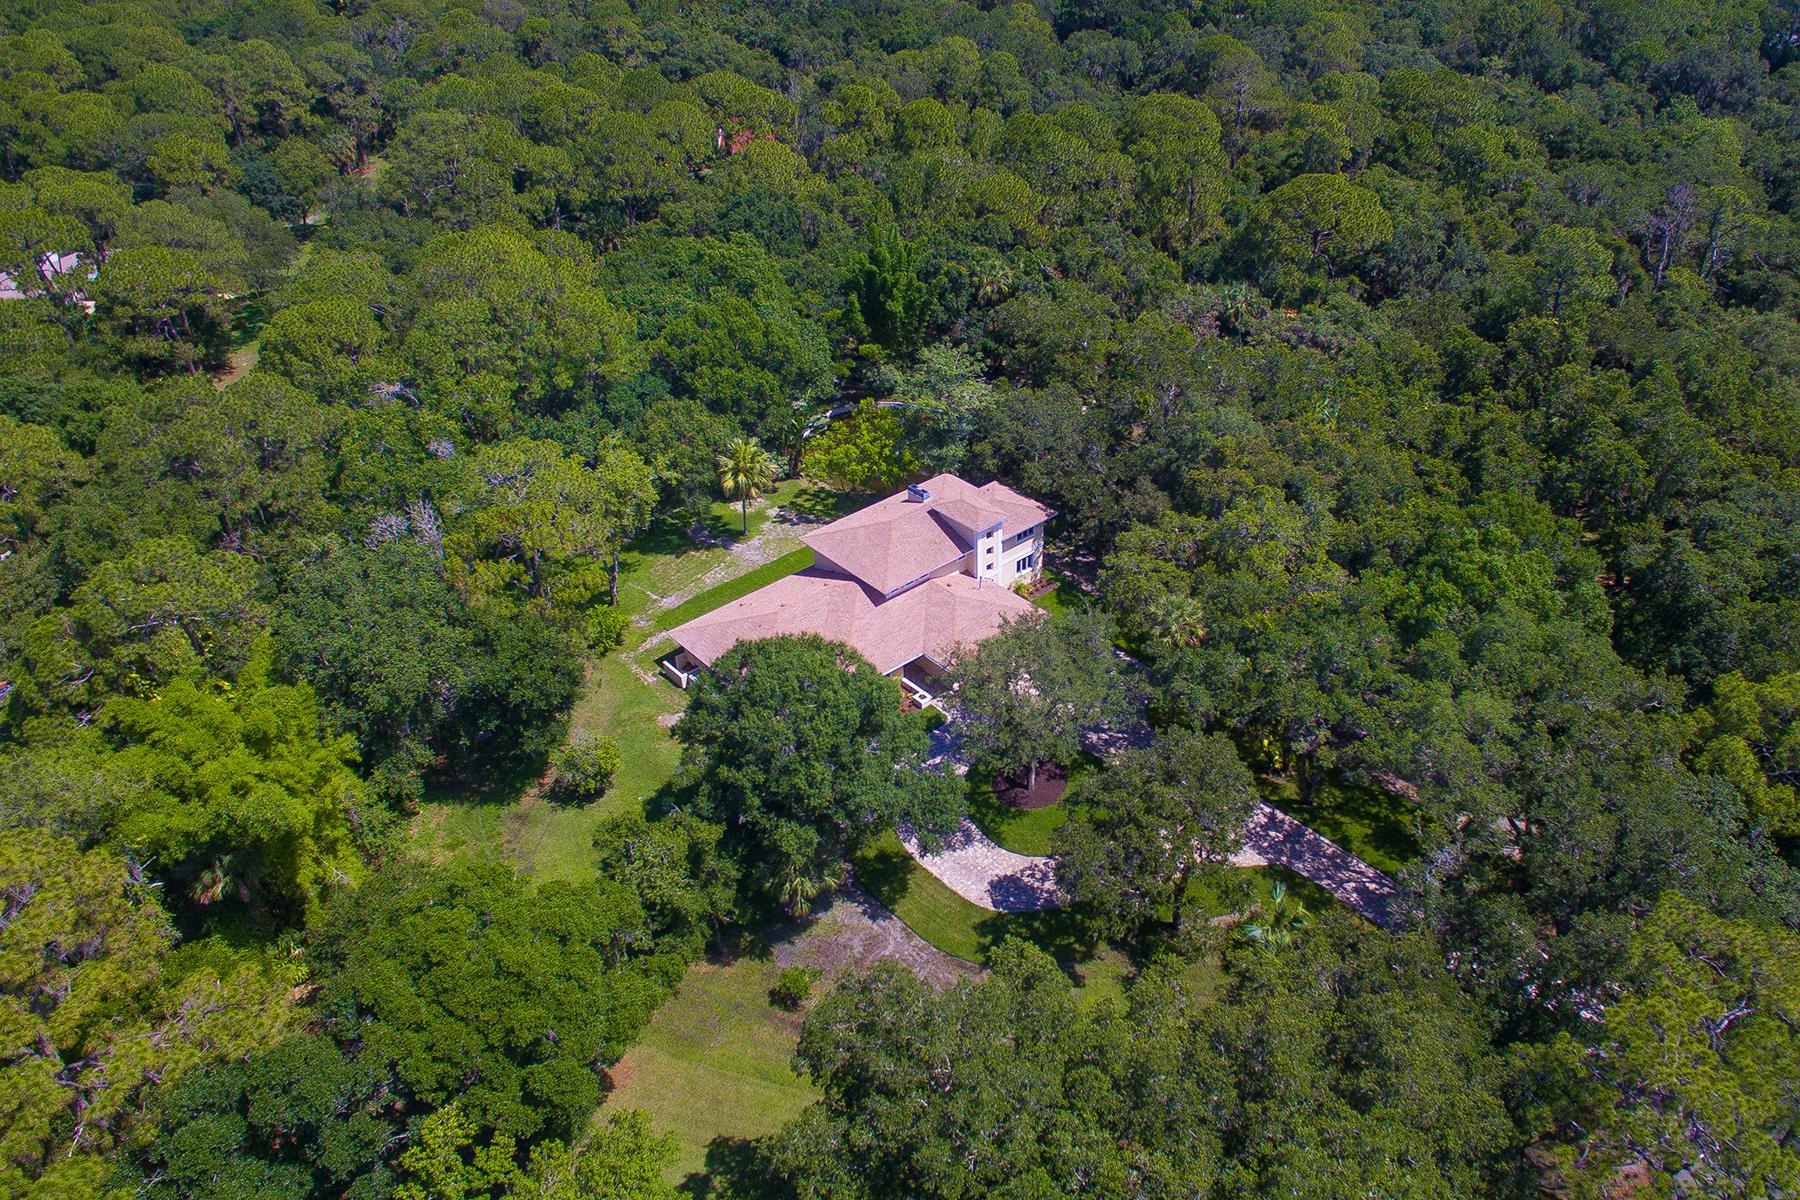 Single Family Home for Sale at BLOOMING GROVE ESTATES 3600 Azalea Ln Sarasota, Florida, 34240 United States